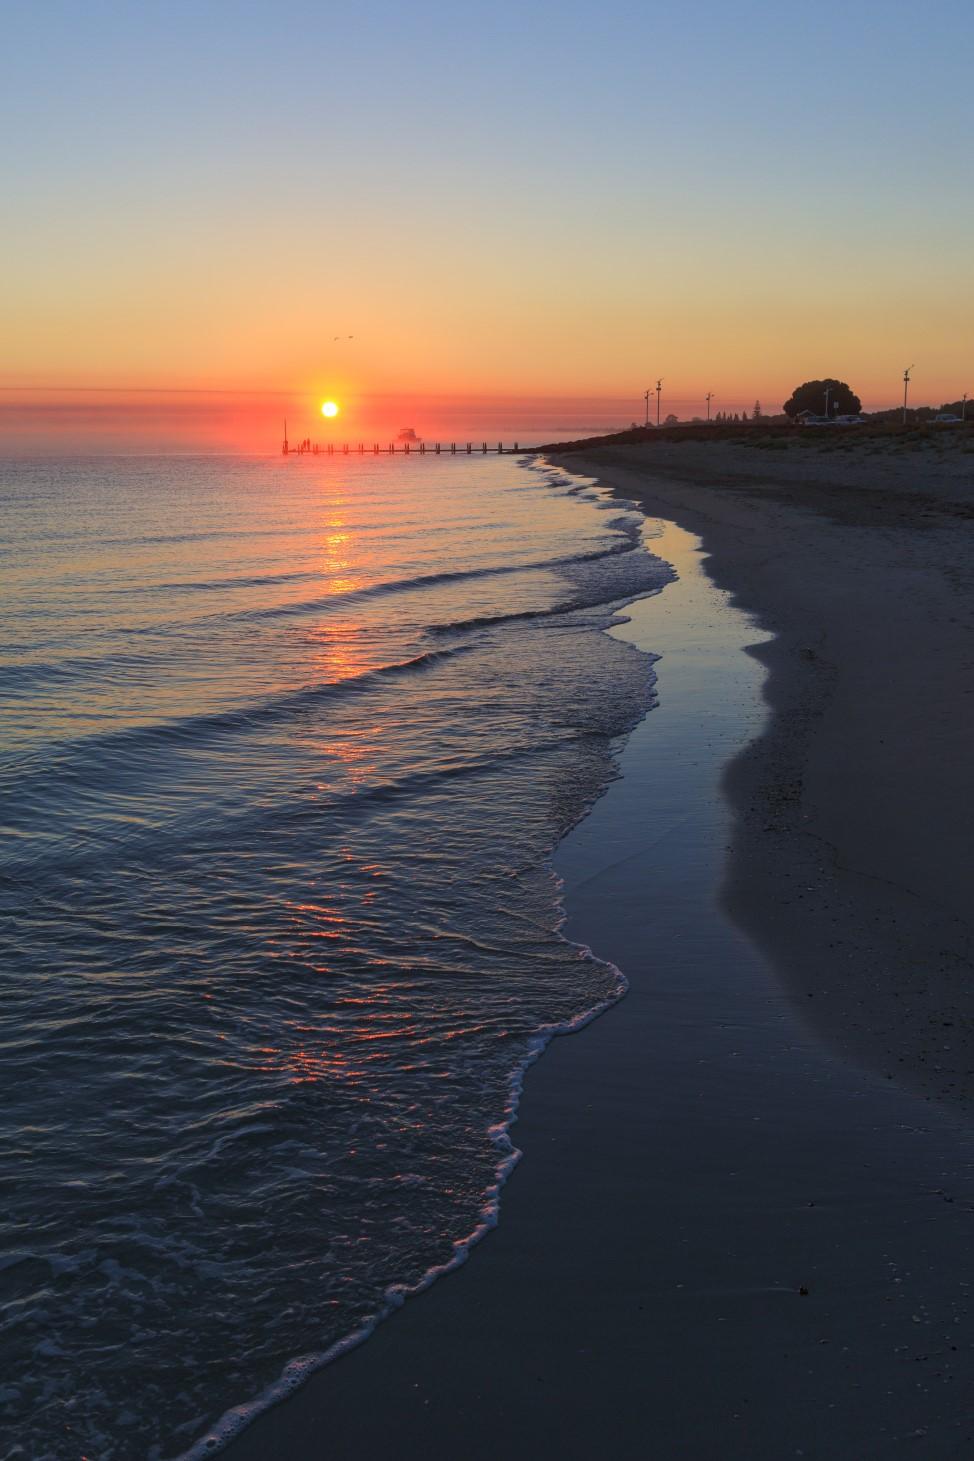 sunrise-dawn-busselton-beach-shore